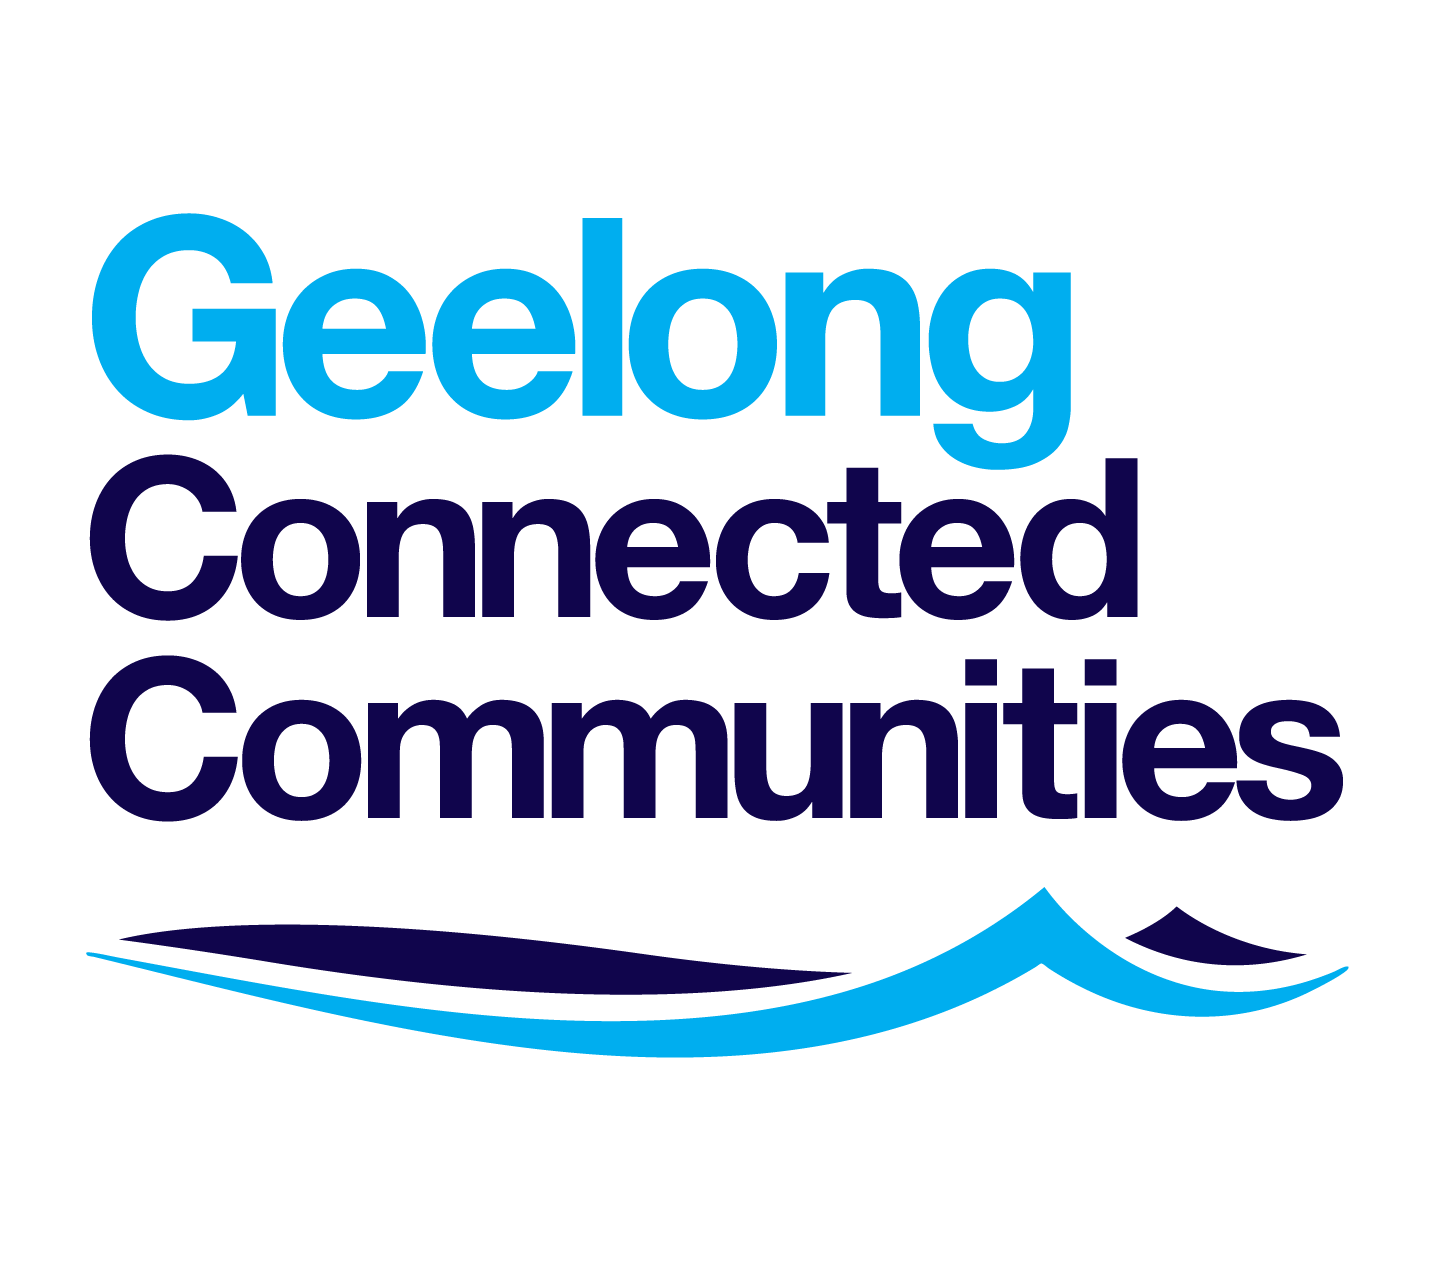 Geelong_Connected_Communities_Logo_Extra-01